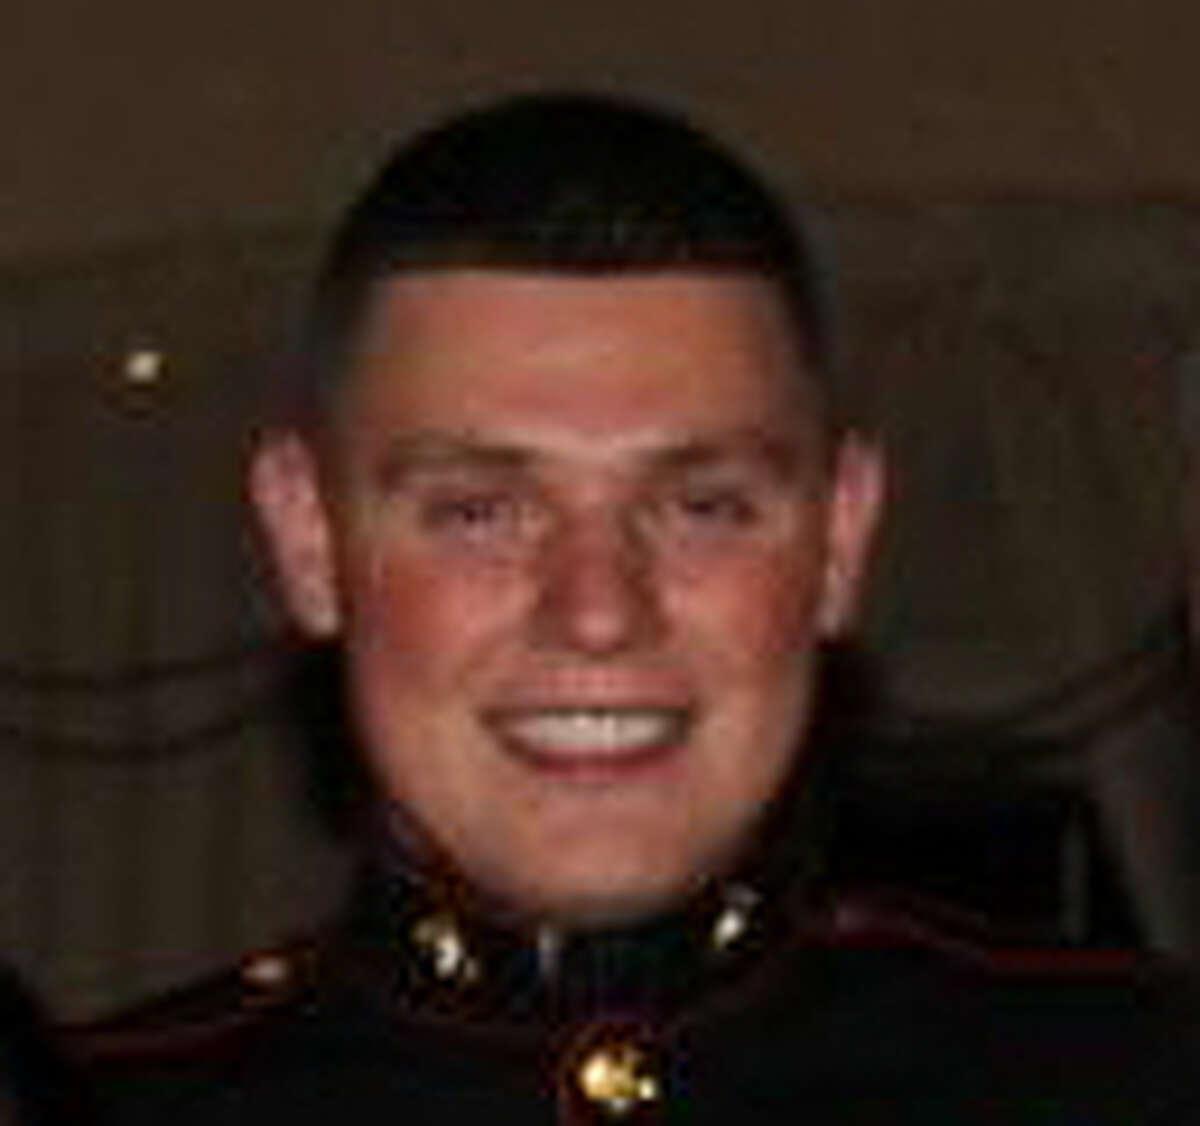 Trooper Donald R. Fredenburg. (State Police)